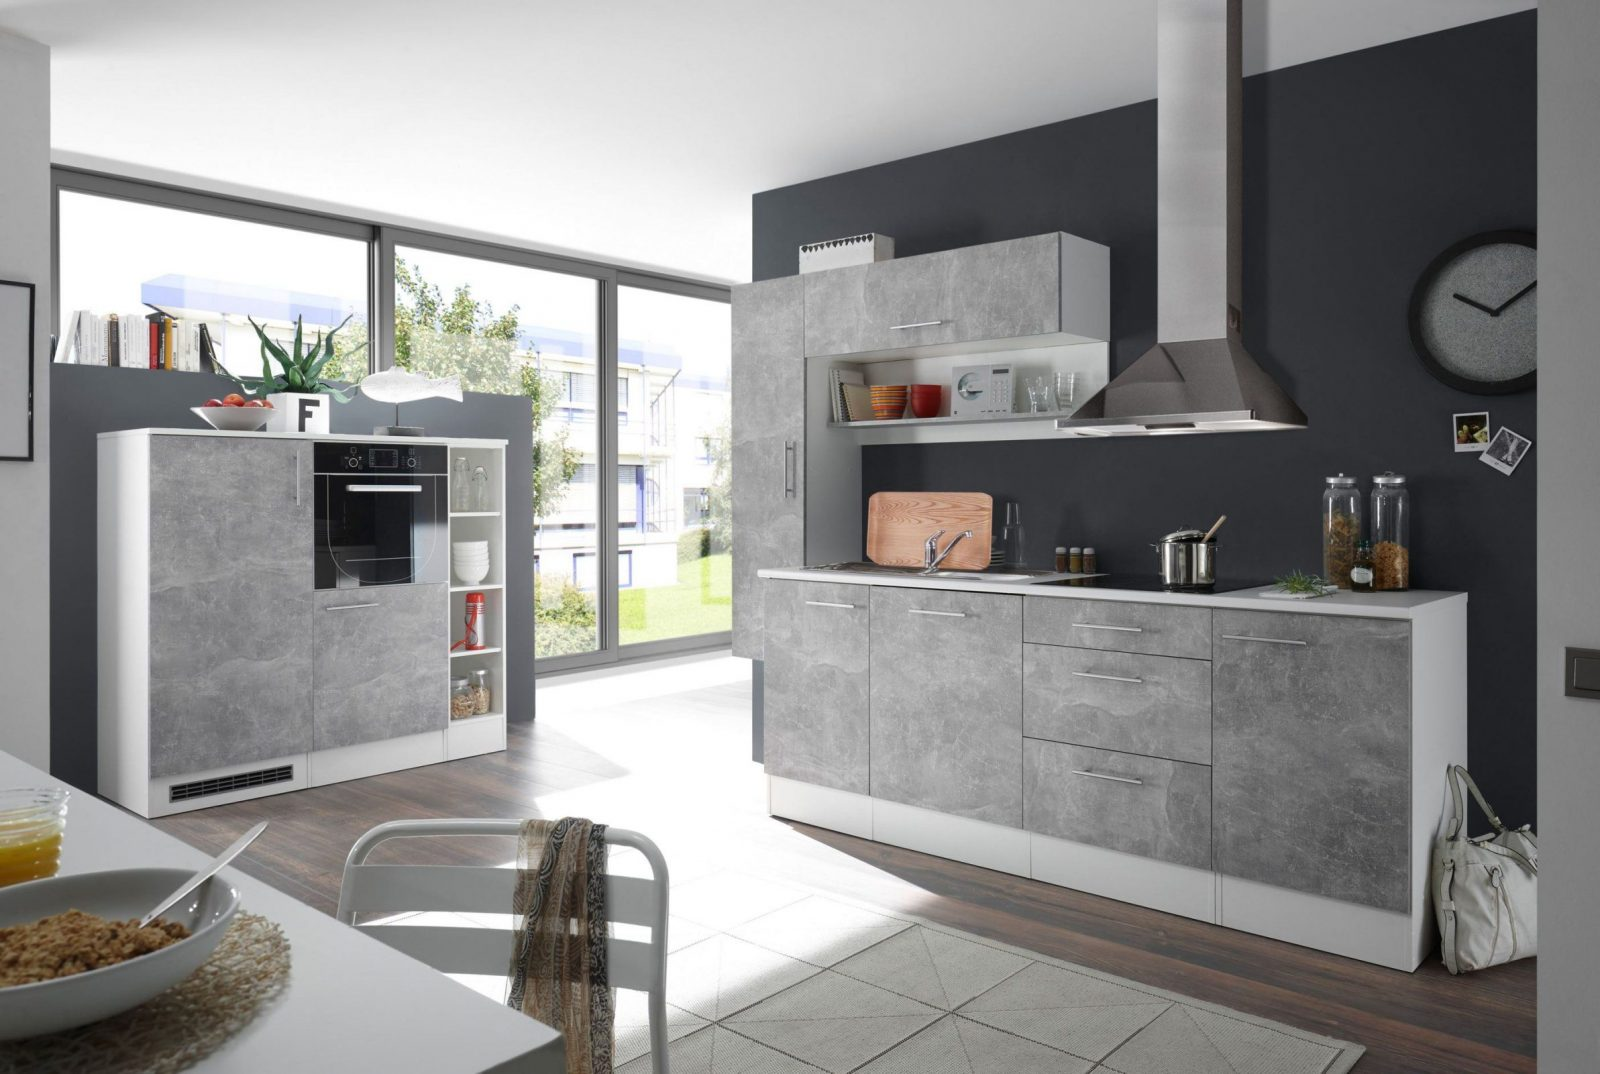 minik che mit elektroger ten k che elektroger te separat. Black Bedroom Furniture Sets. Home Design Ideas